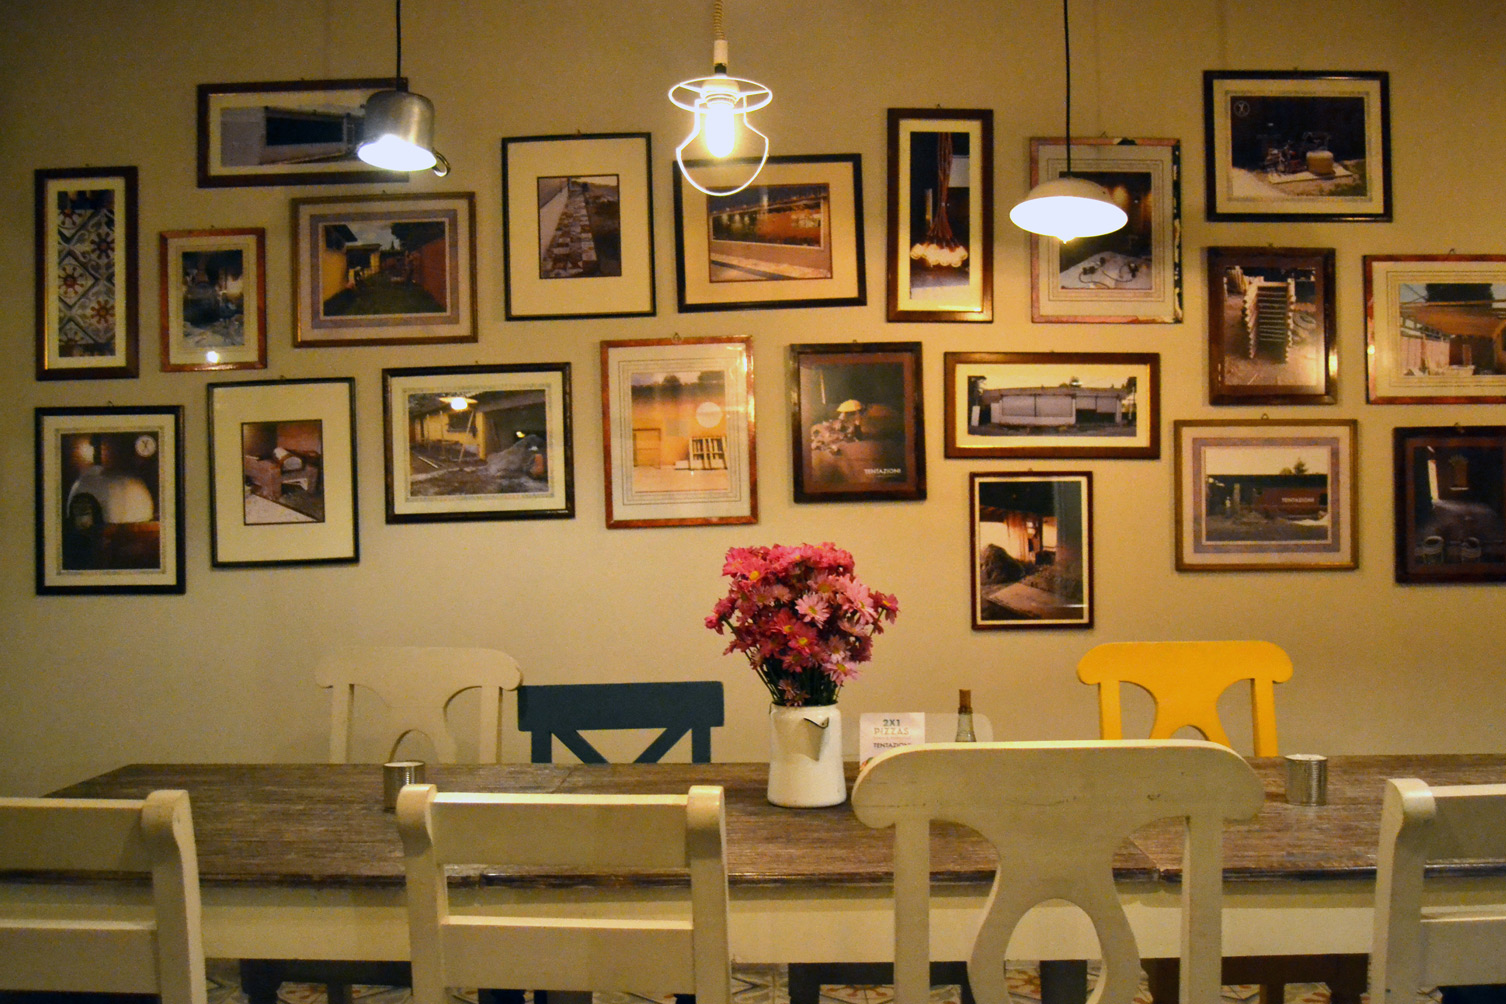 tentazioni-restaurante-salon-belleza-peluqueria-tijeras-pizzeria-restaurante-familia-alvarado-xela-guatemala-quetzaltenango-pizza-mesas-sillas-cuarto-ambiente